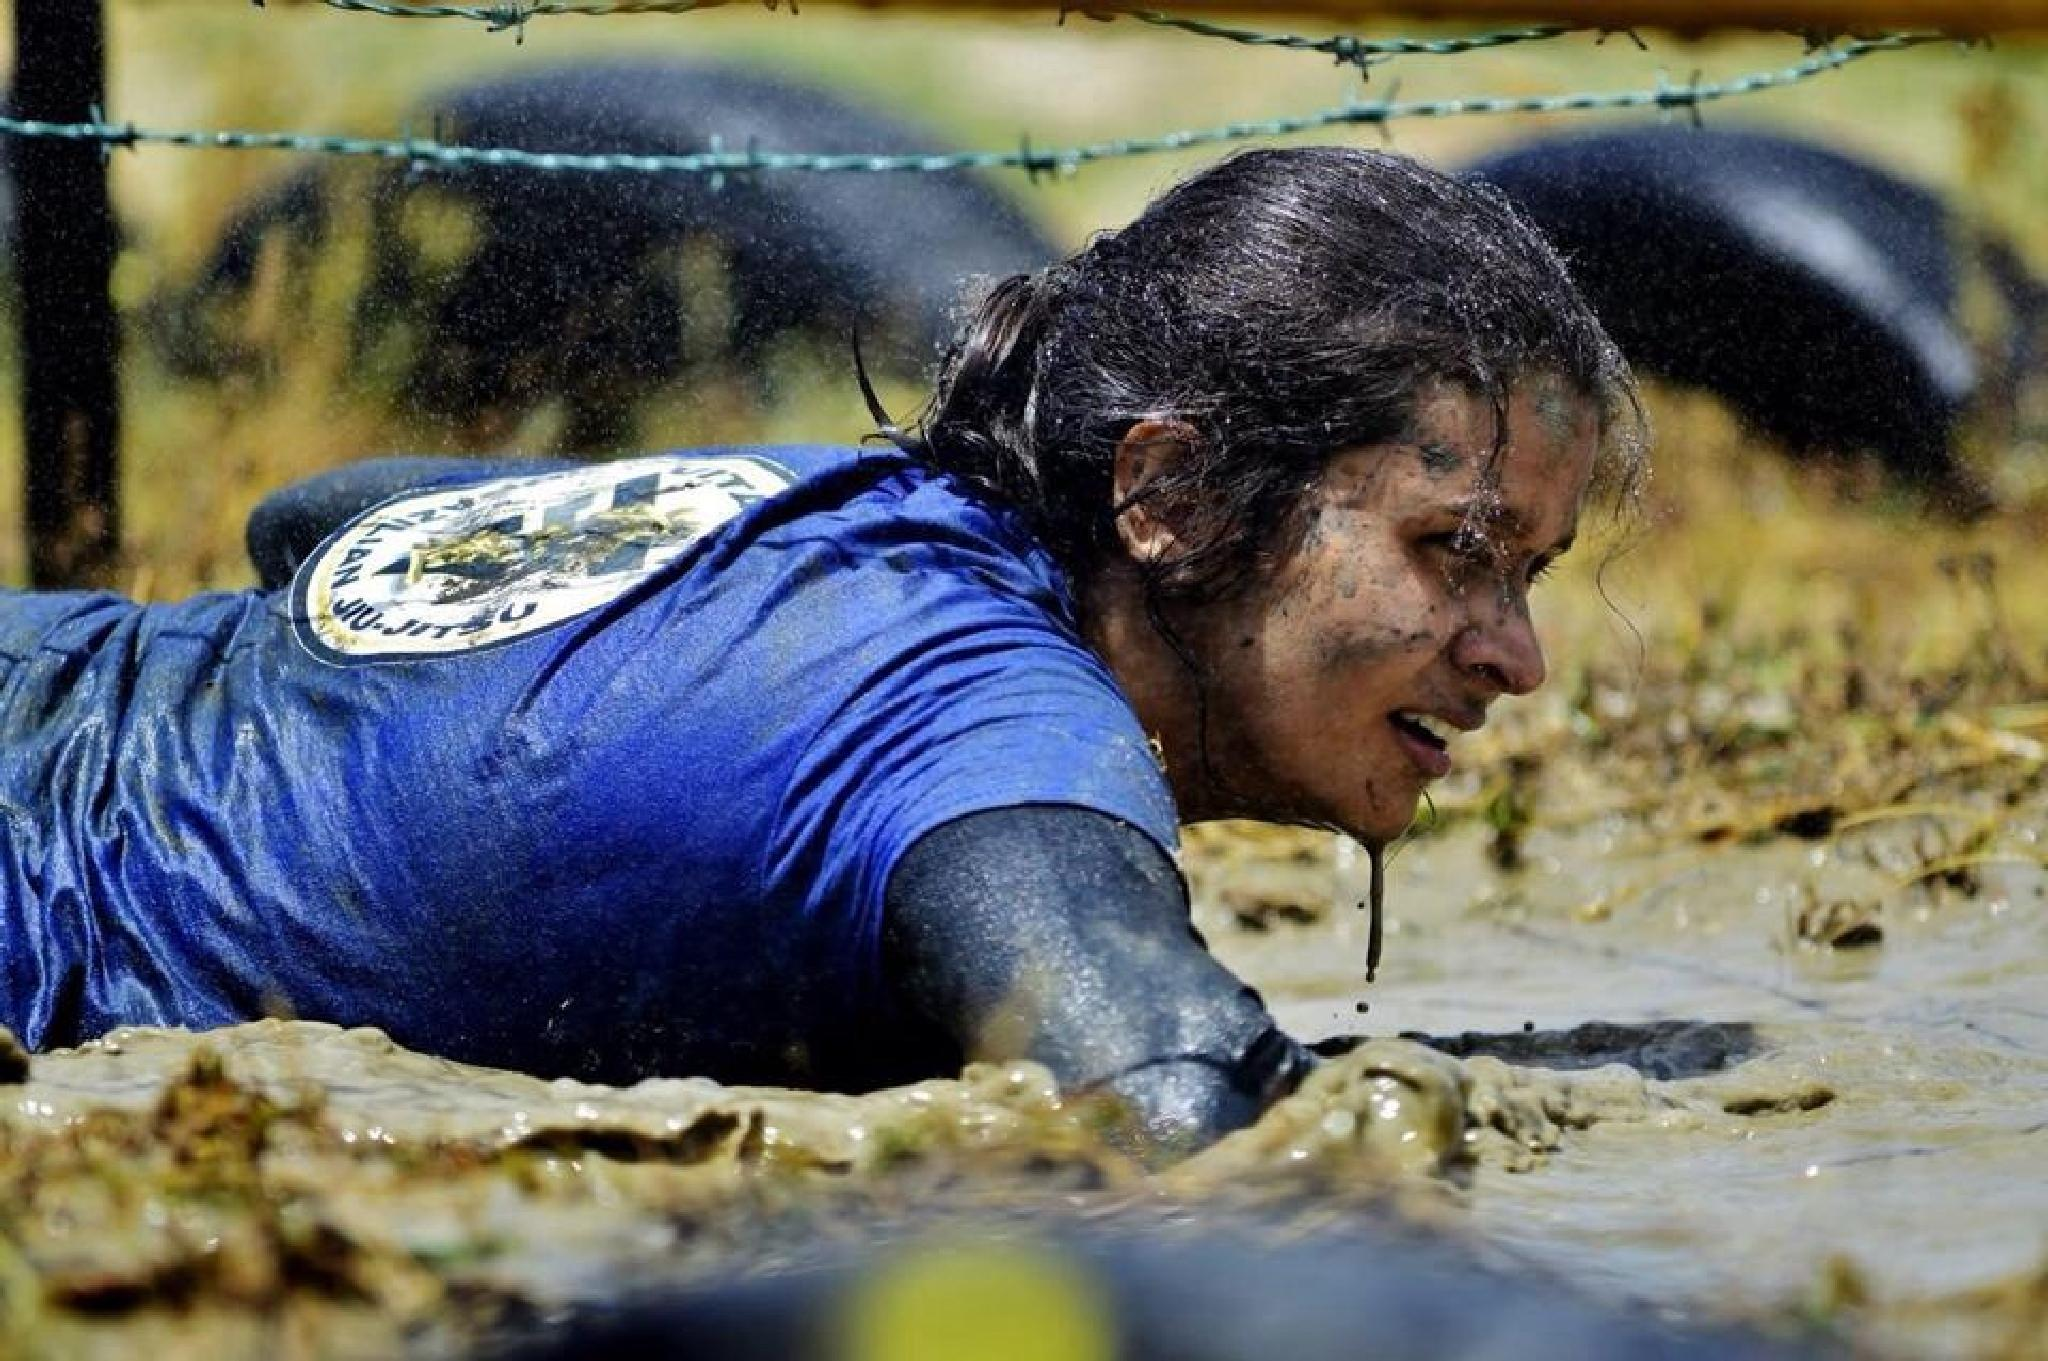 Amphibia Challenge by Cristina Lavrador